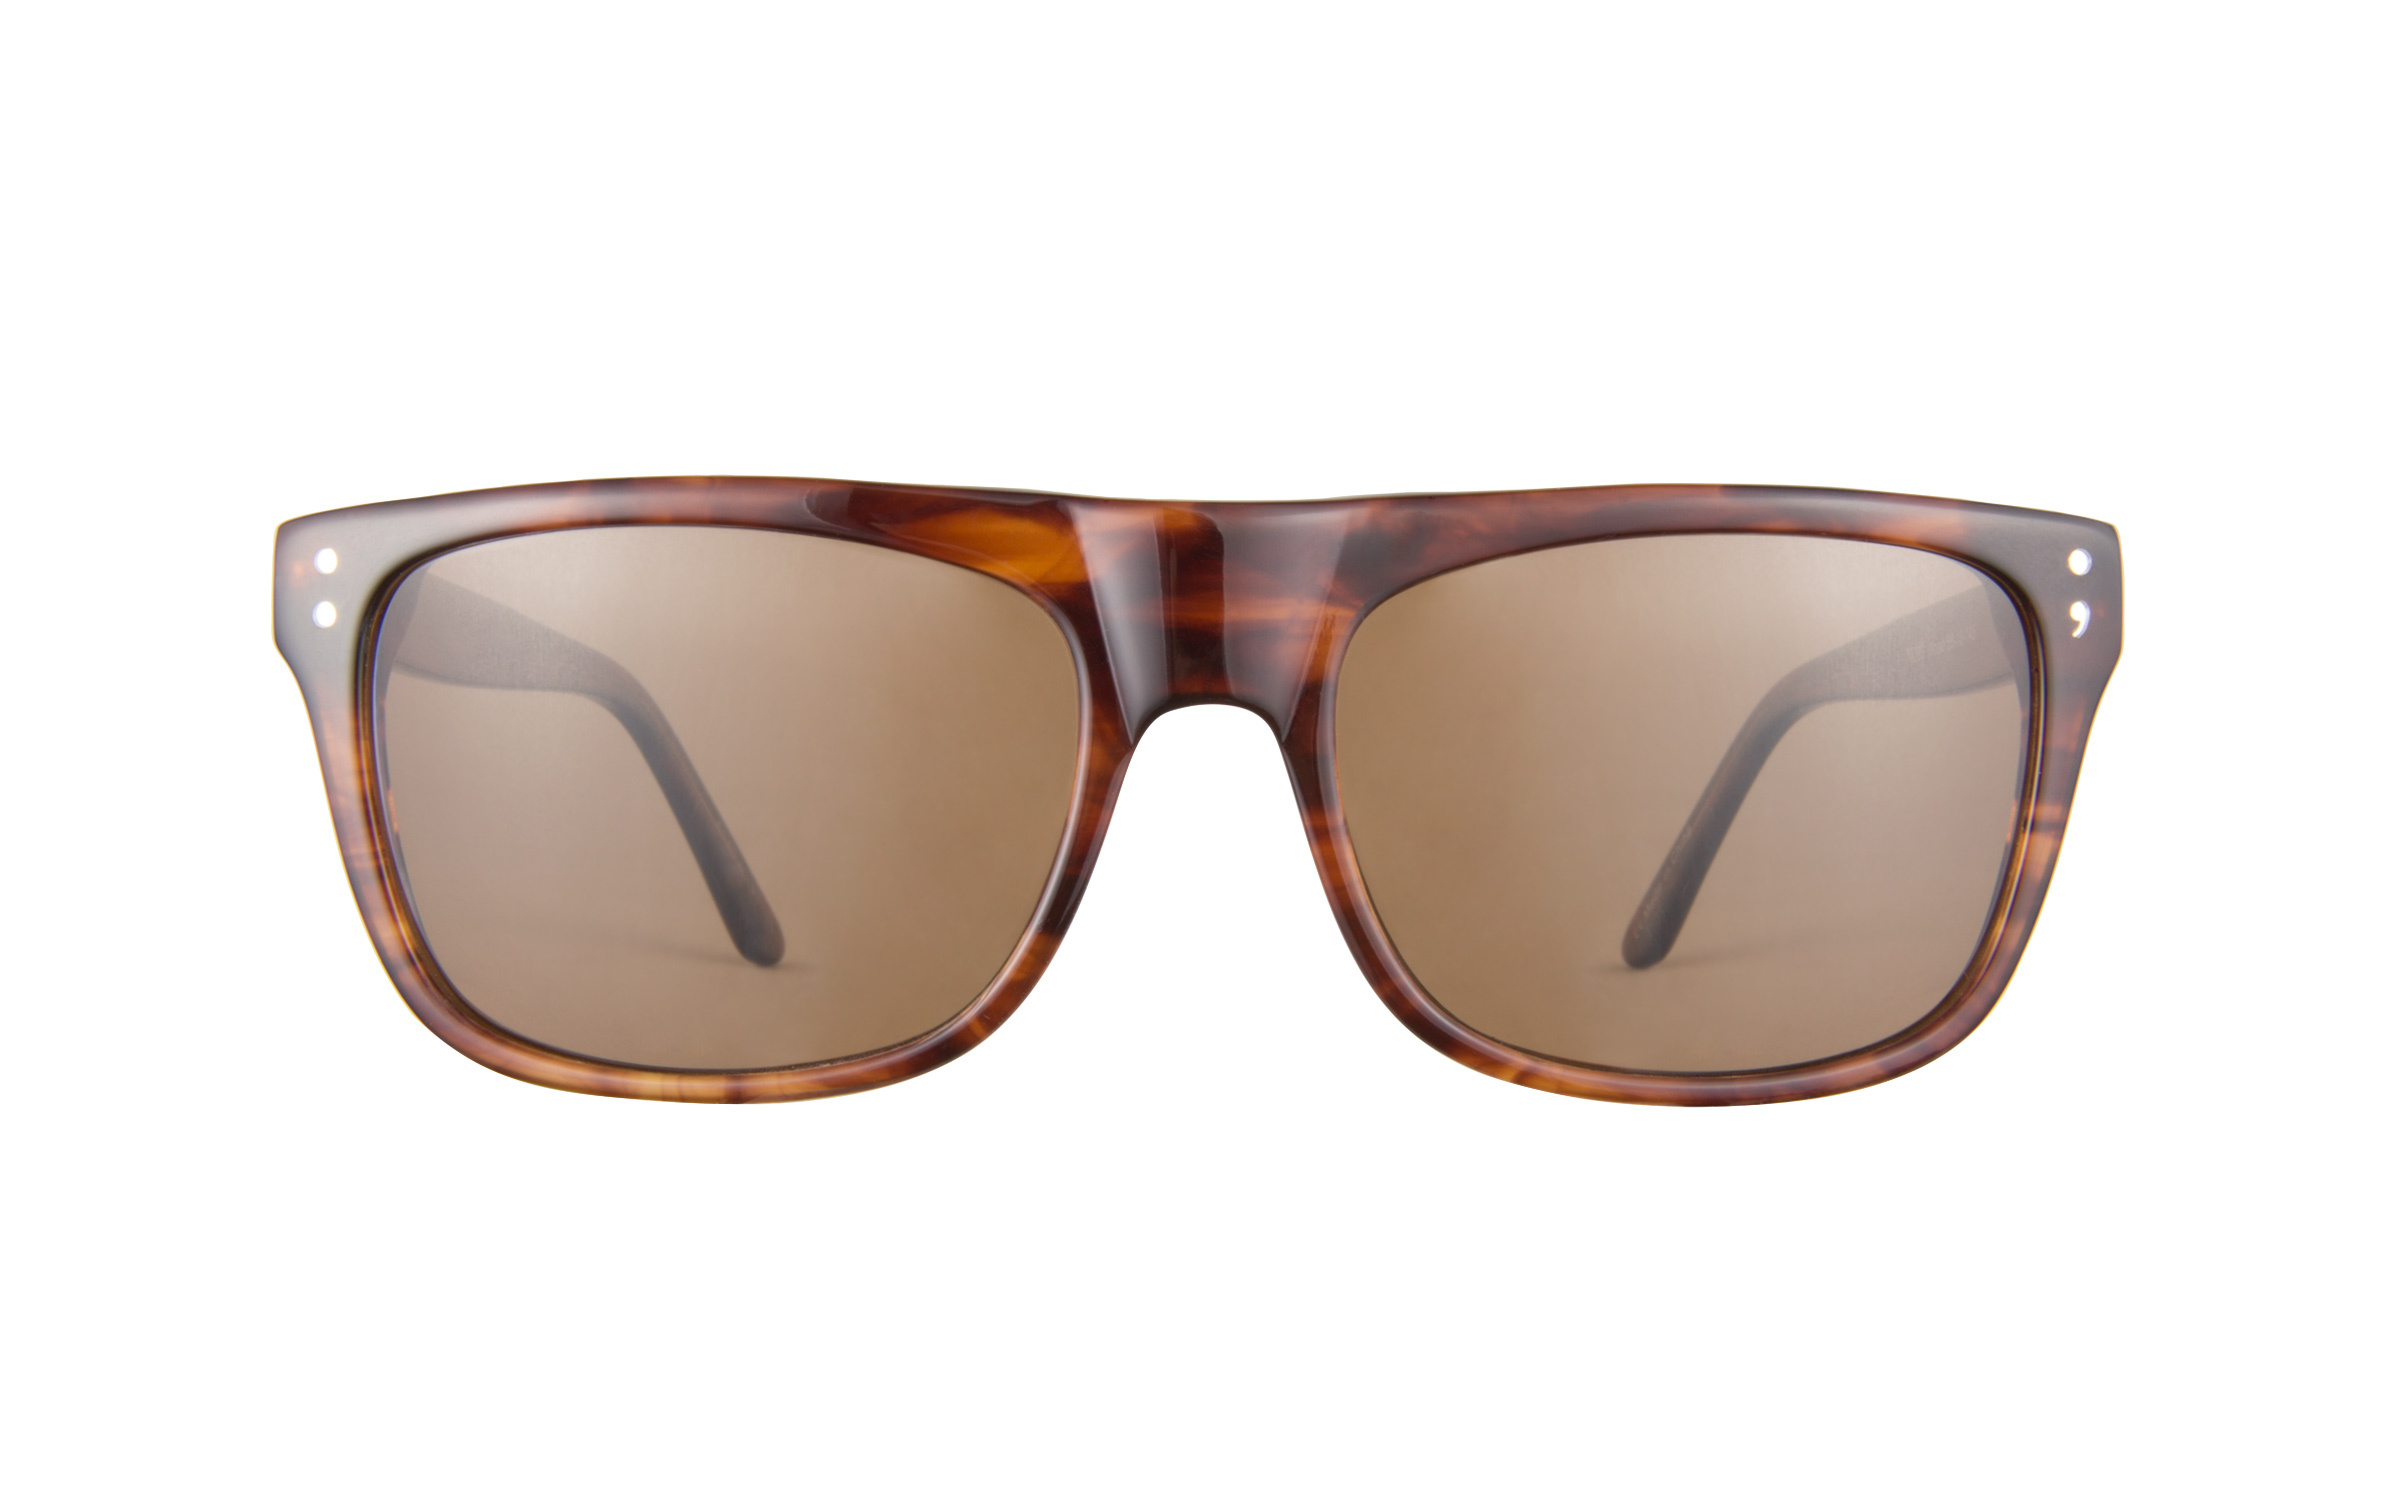 Rectangular_Sunglasses_Brown_Derek_Cardigan_Online_Coastal